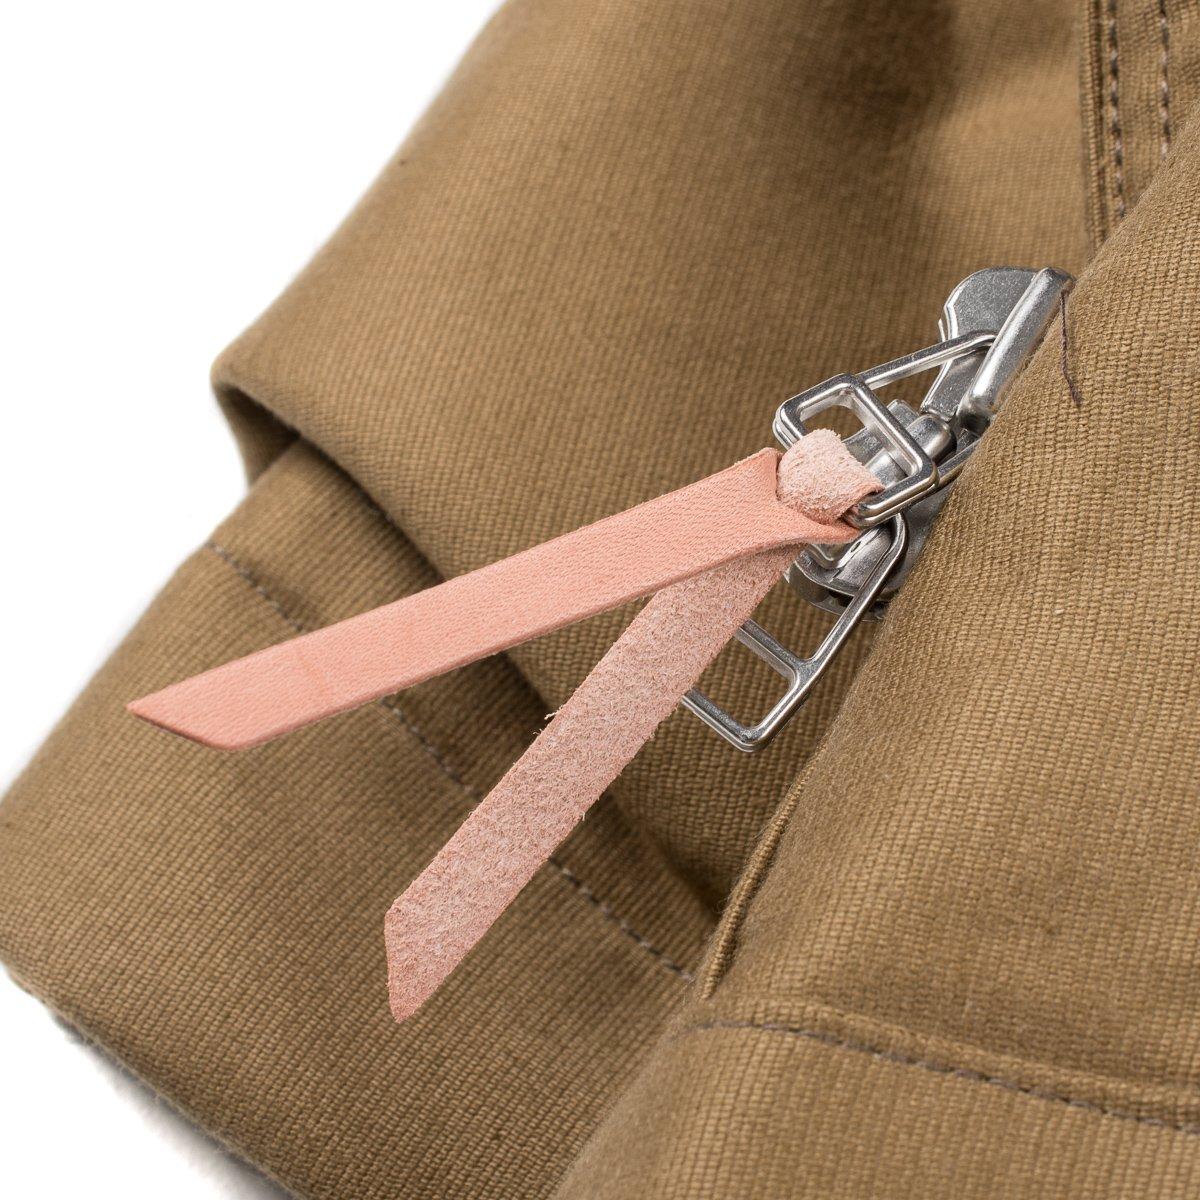 125214351a1 ... Khaki Alpaca Lined Whipcord N1 Deck Half-Coat ...